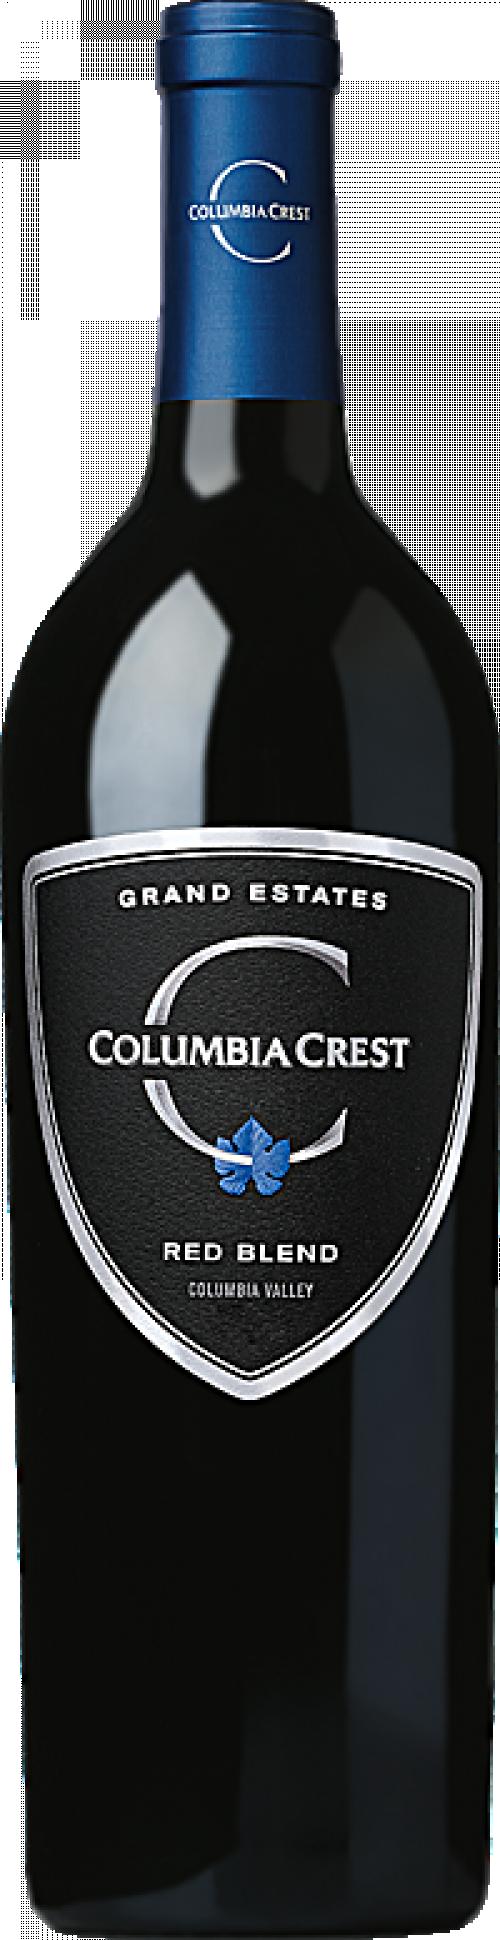 2015 Columbia Crest Grand Estates Red Blend 750ml